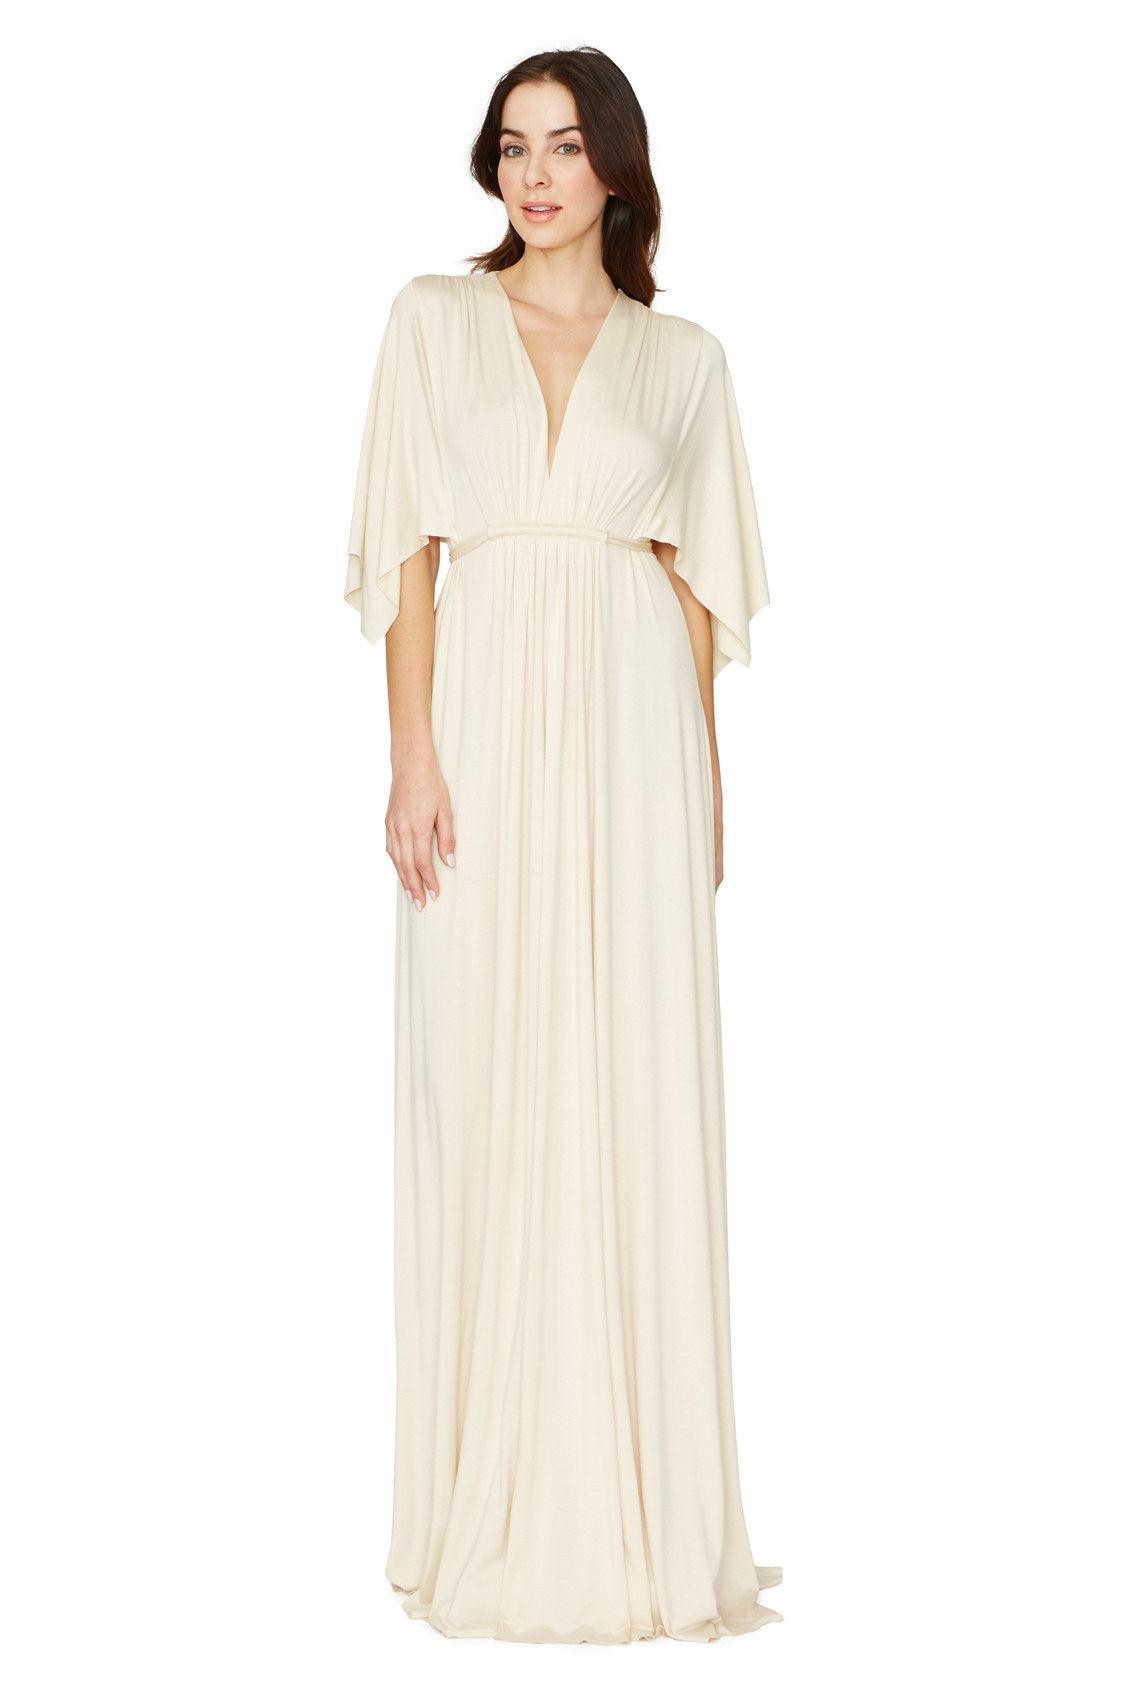 46079de277805 LONG CAFTAN DRESS - CREAM | Outfit Inspiration in 2019 | Dresses ...